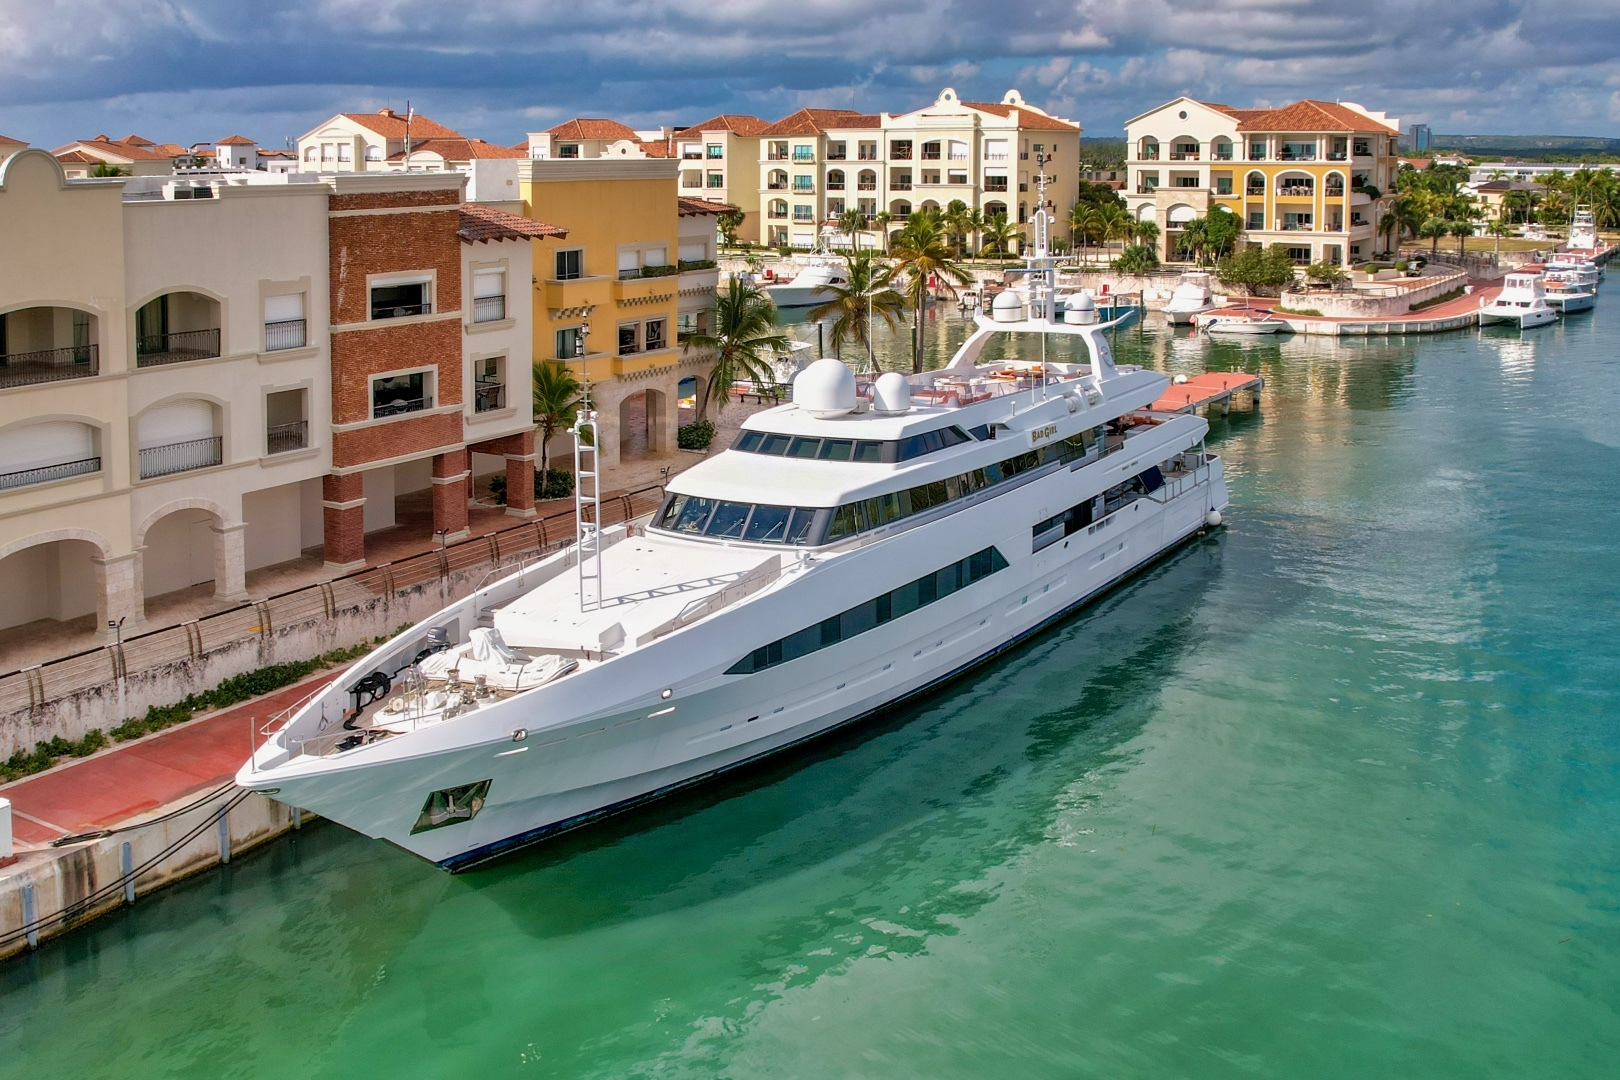 1991 Brooke Yachts 186'